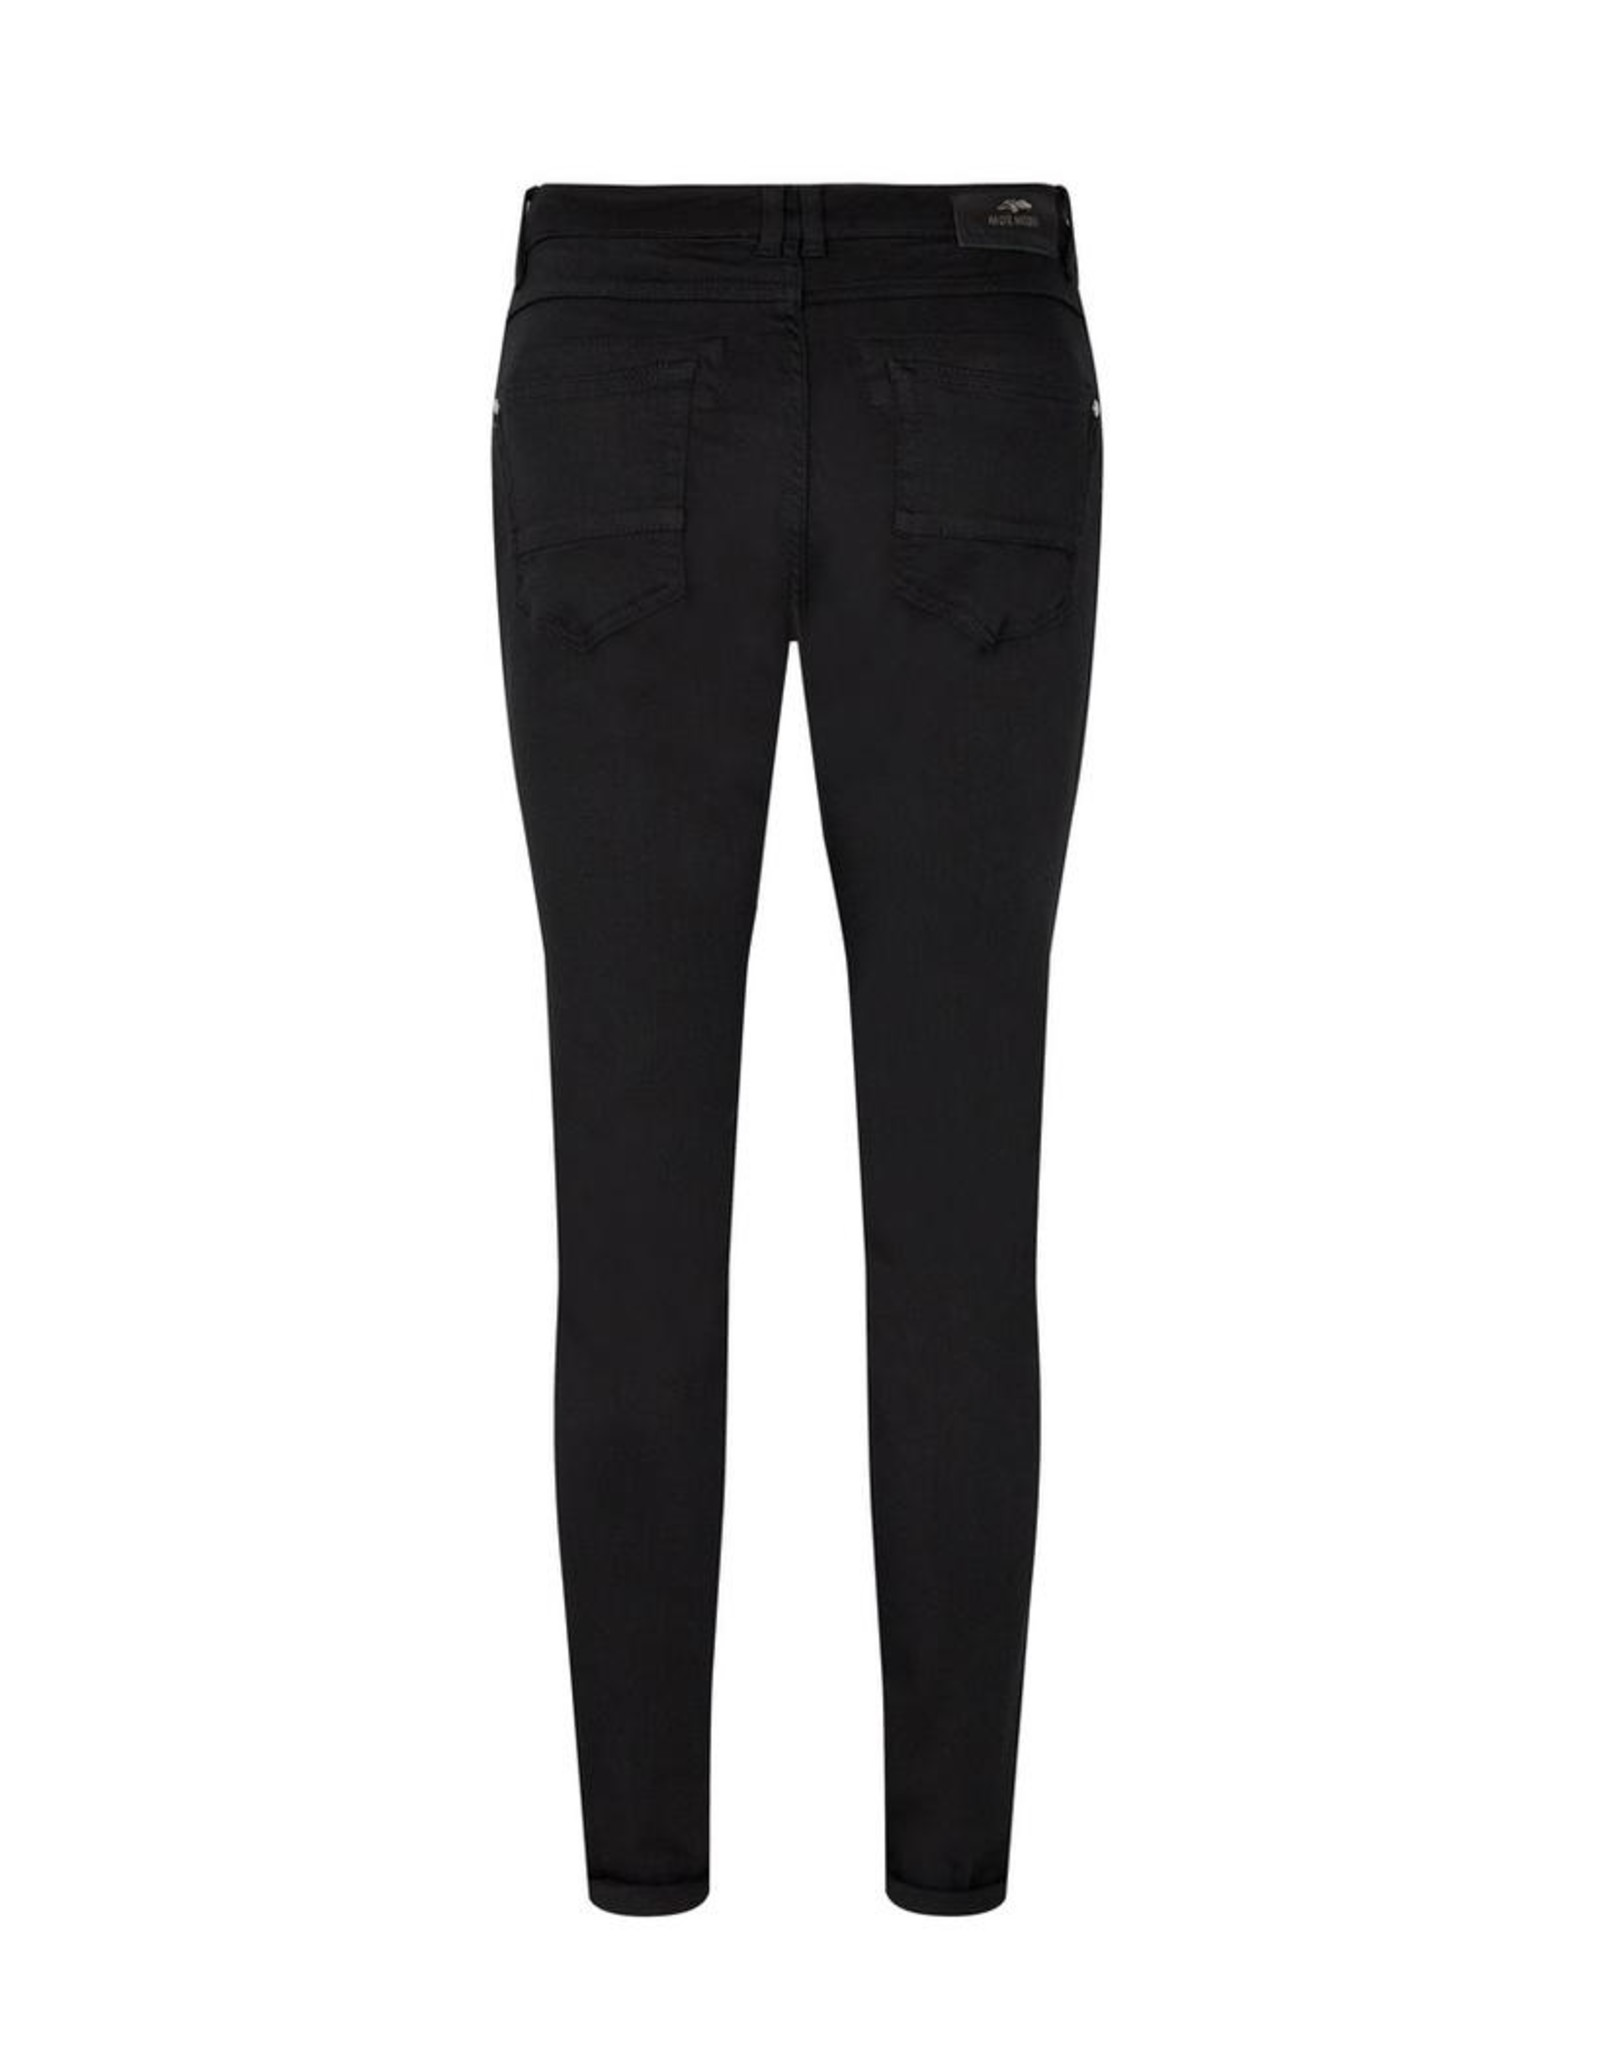 Mos Mosh Naomi Shade Core Jeans